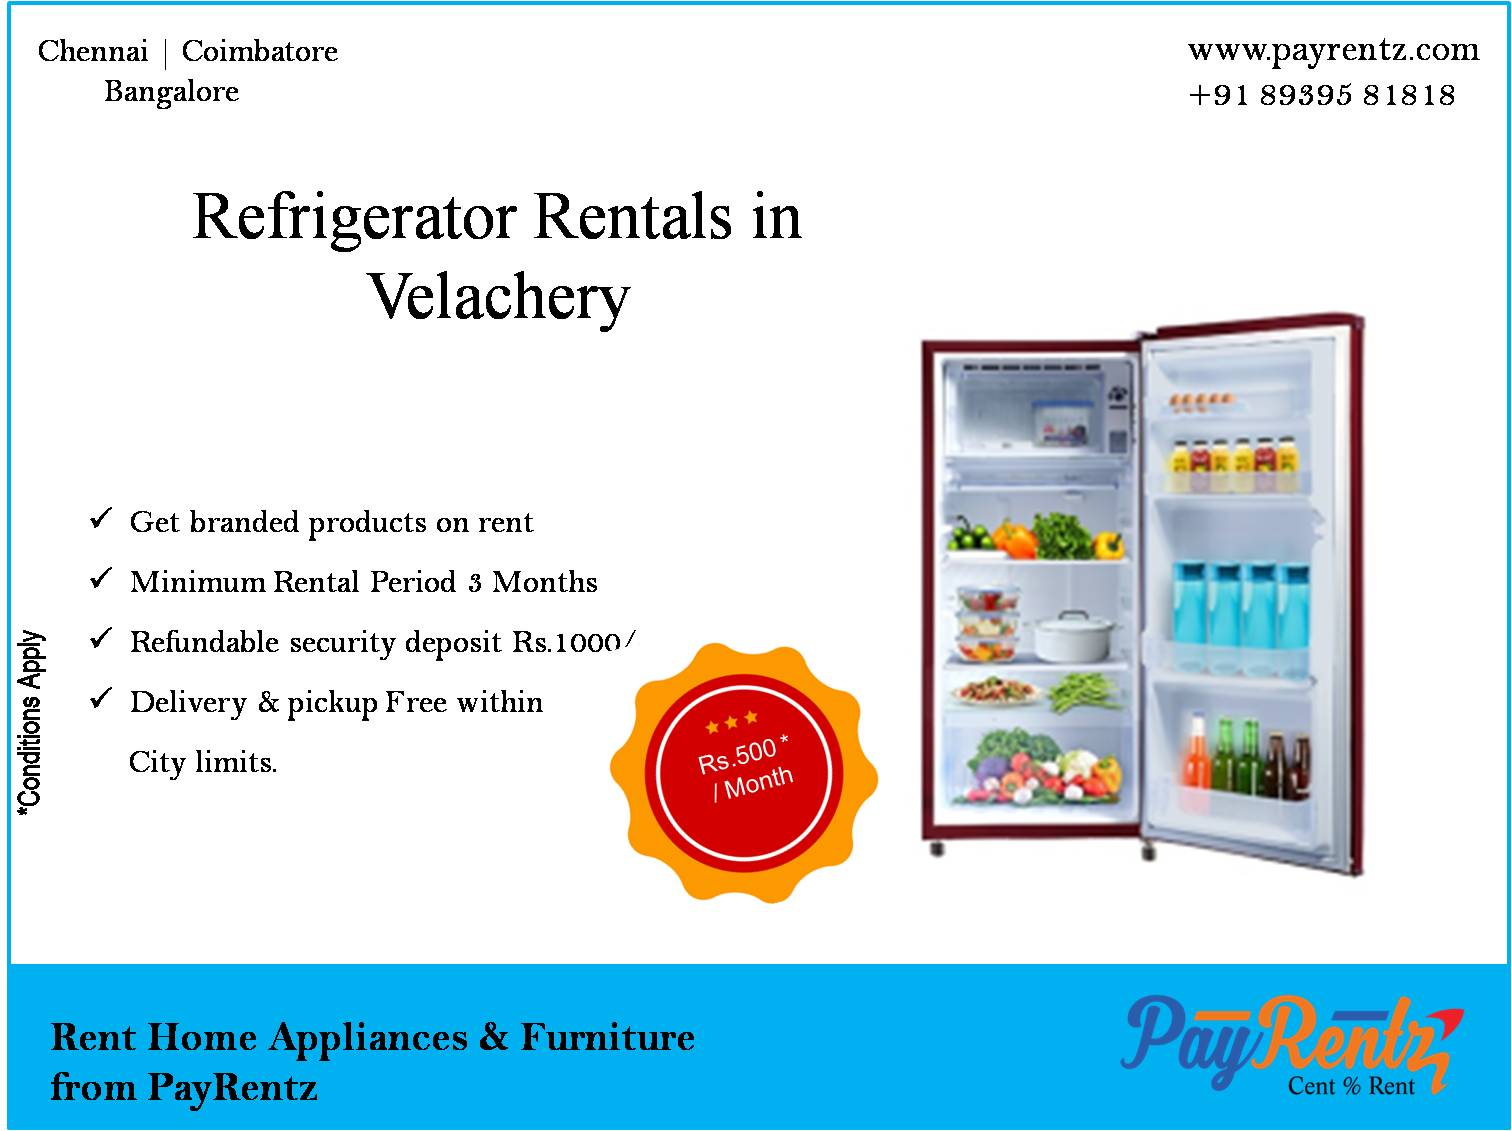 fridge, freezer, 190L fridge, single door fridge,